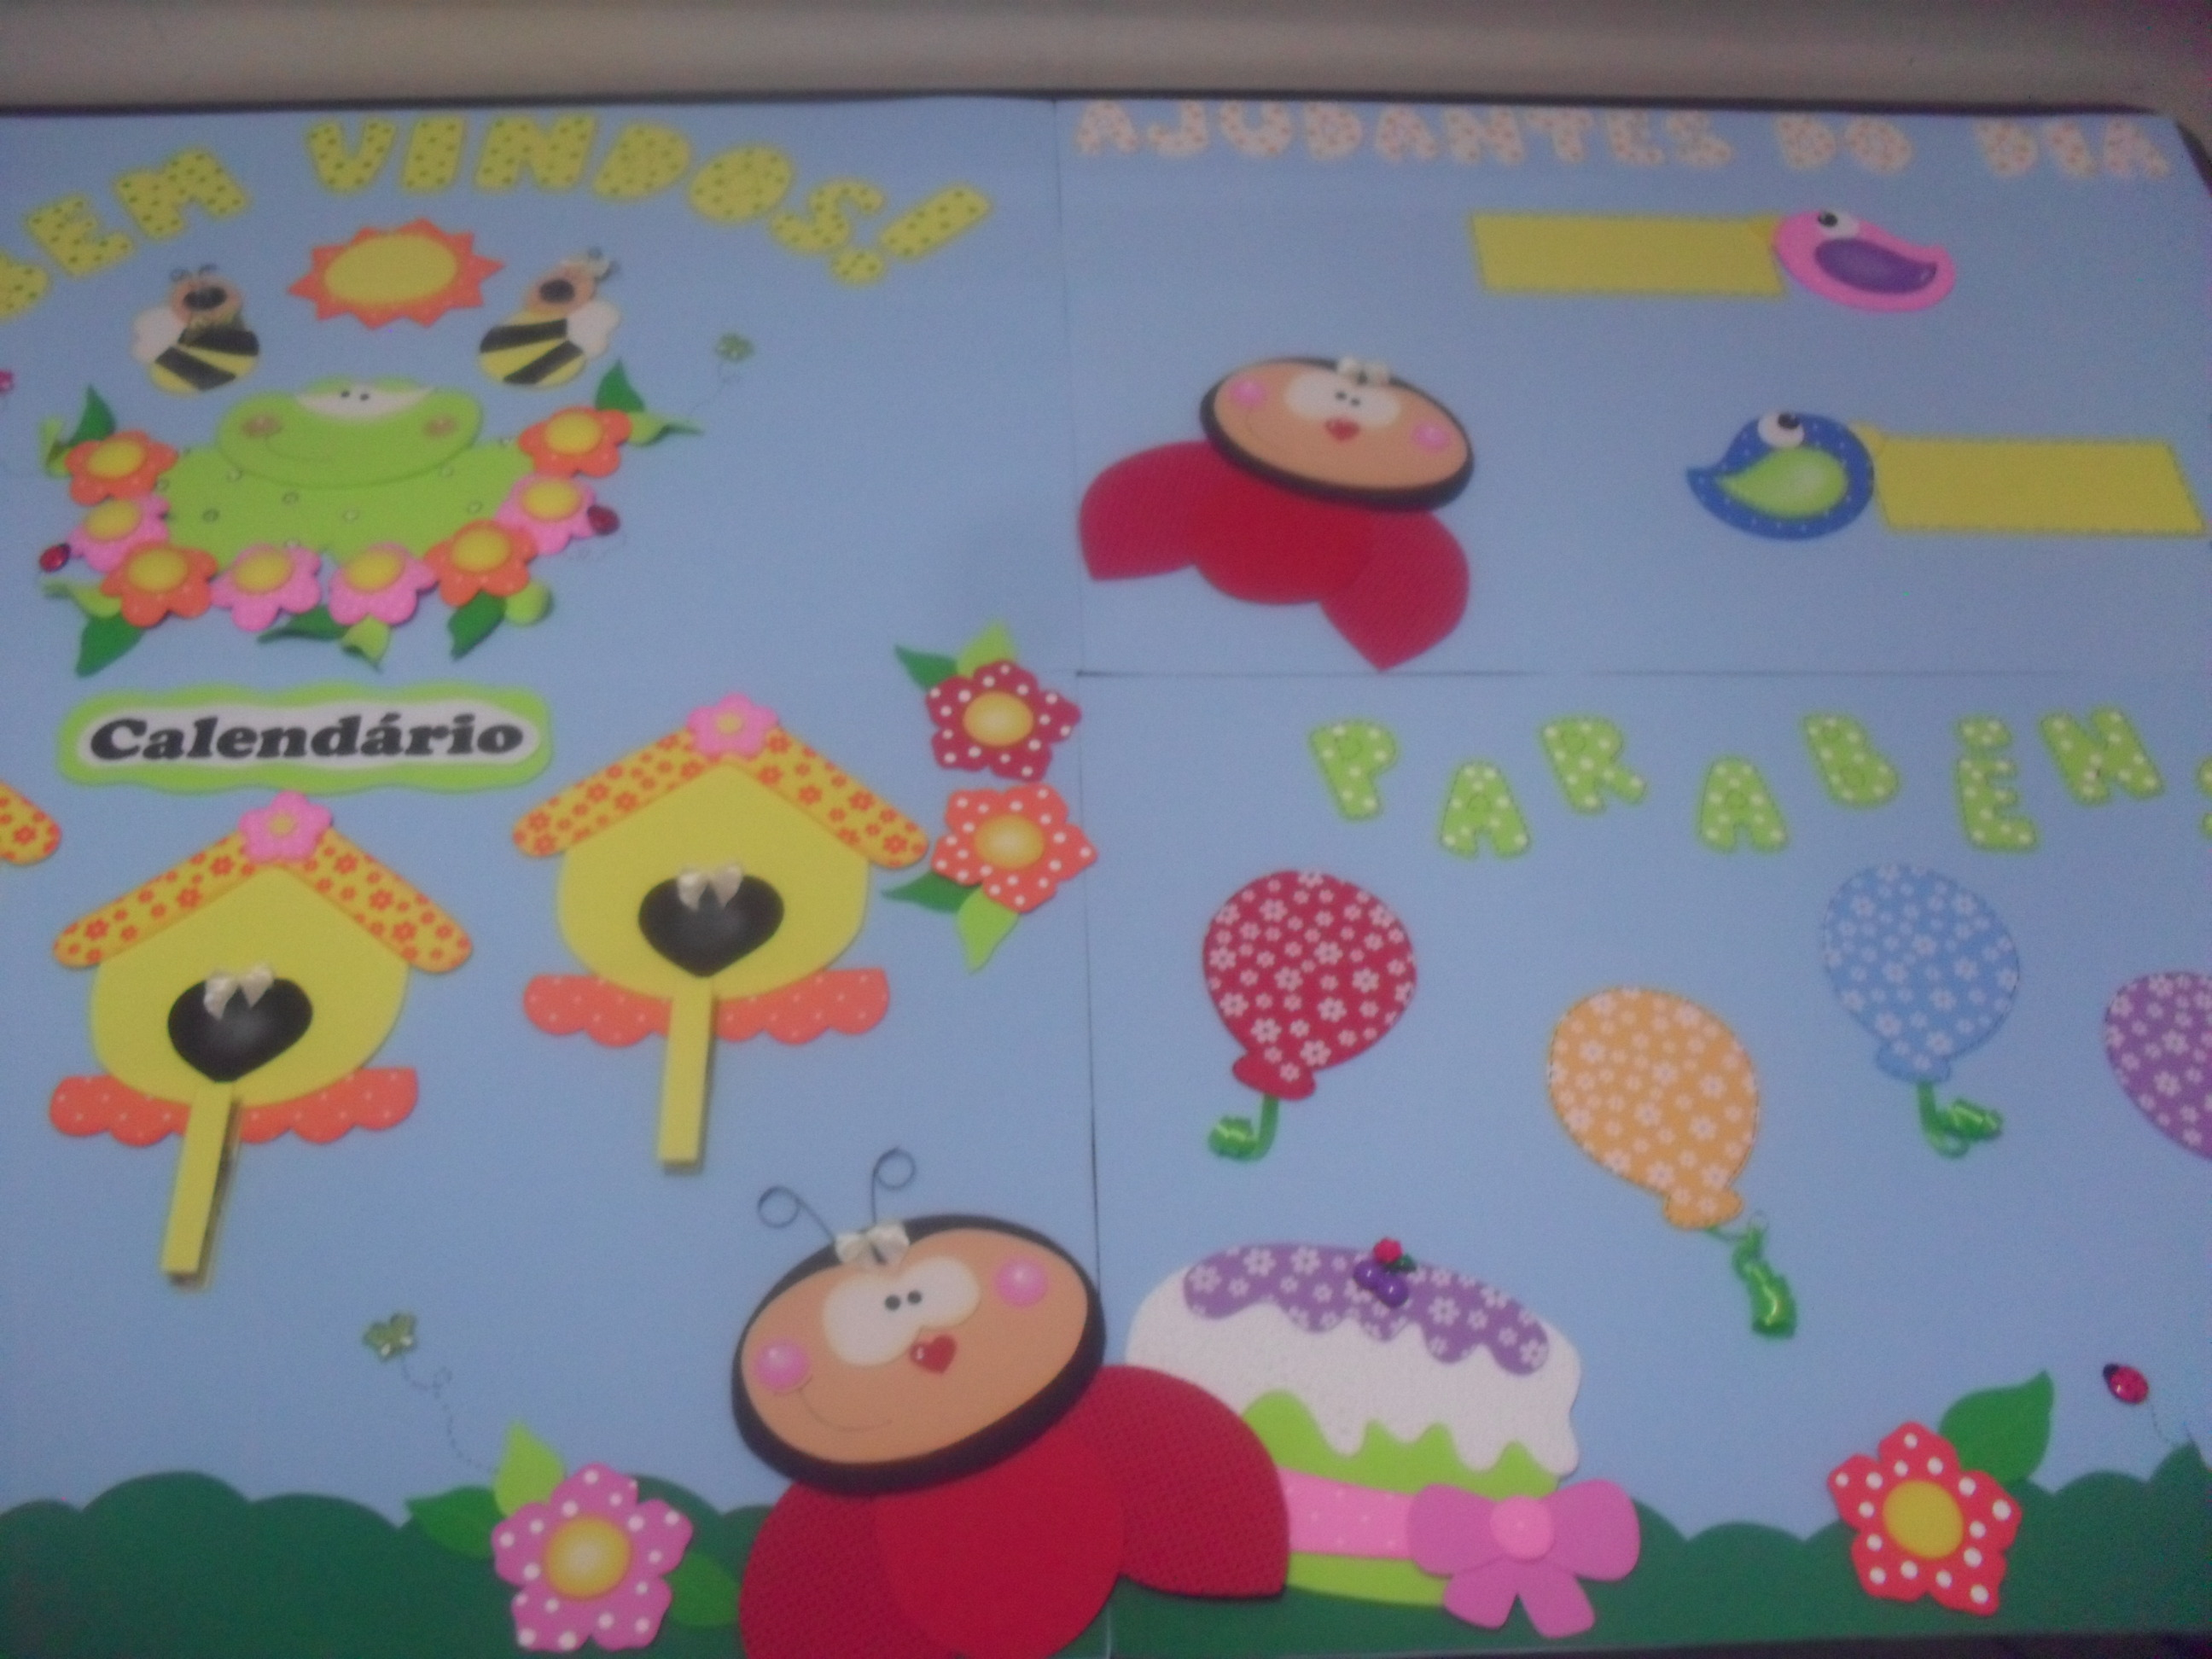 decoracao sala de aula jardim encantado:de sala de aula Jardim Kit Decoração de sala de aula Jardim